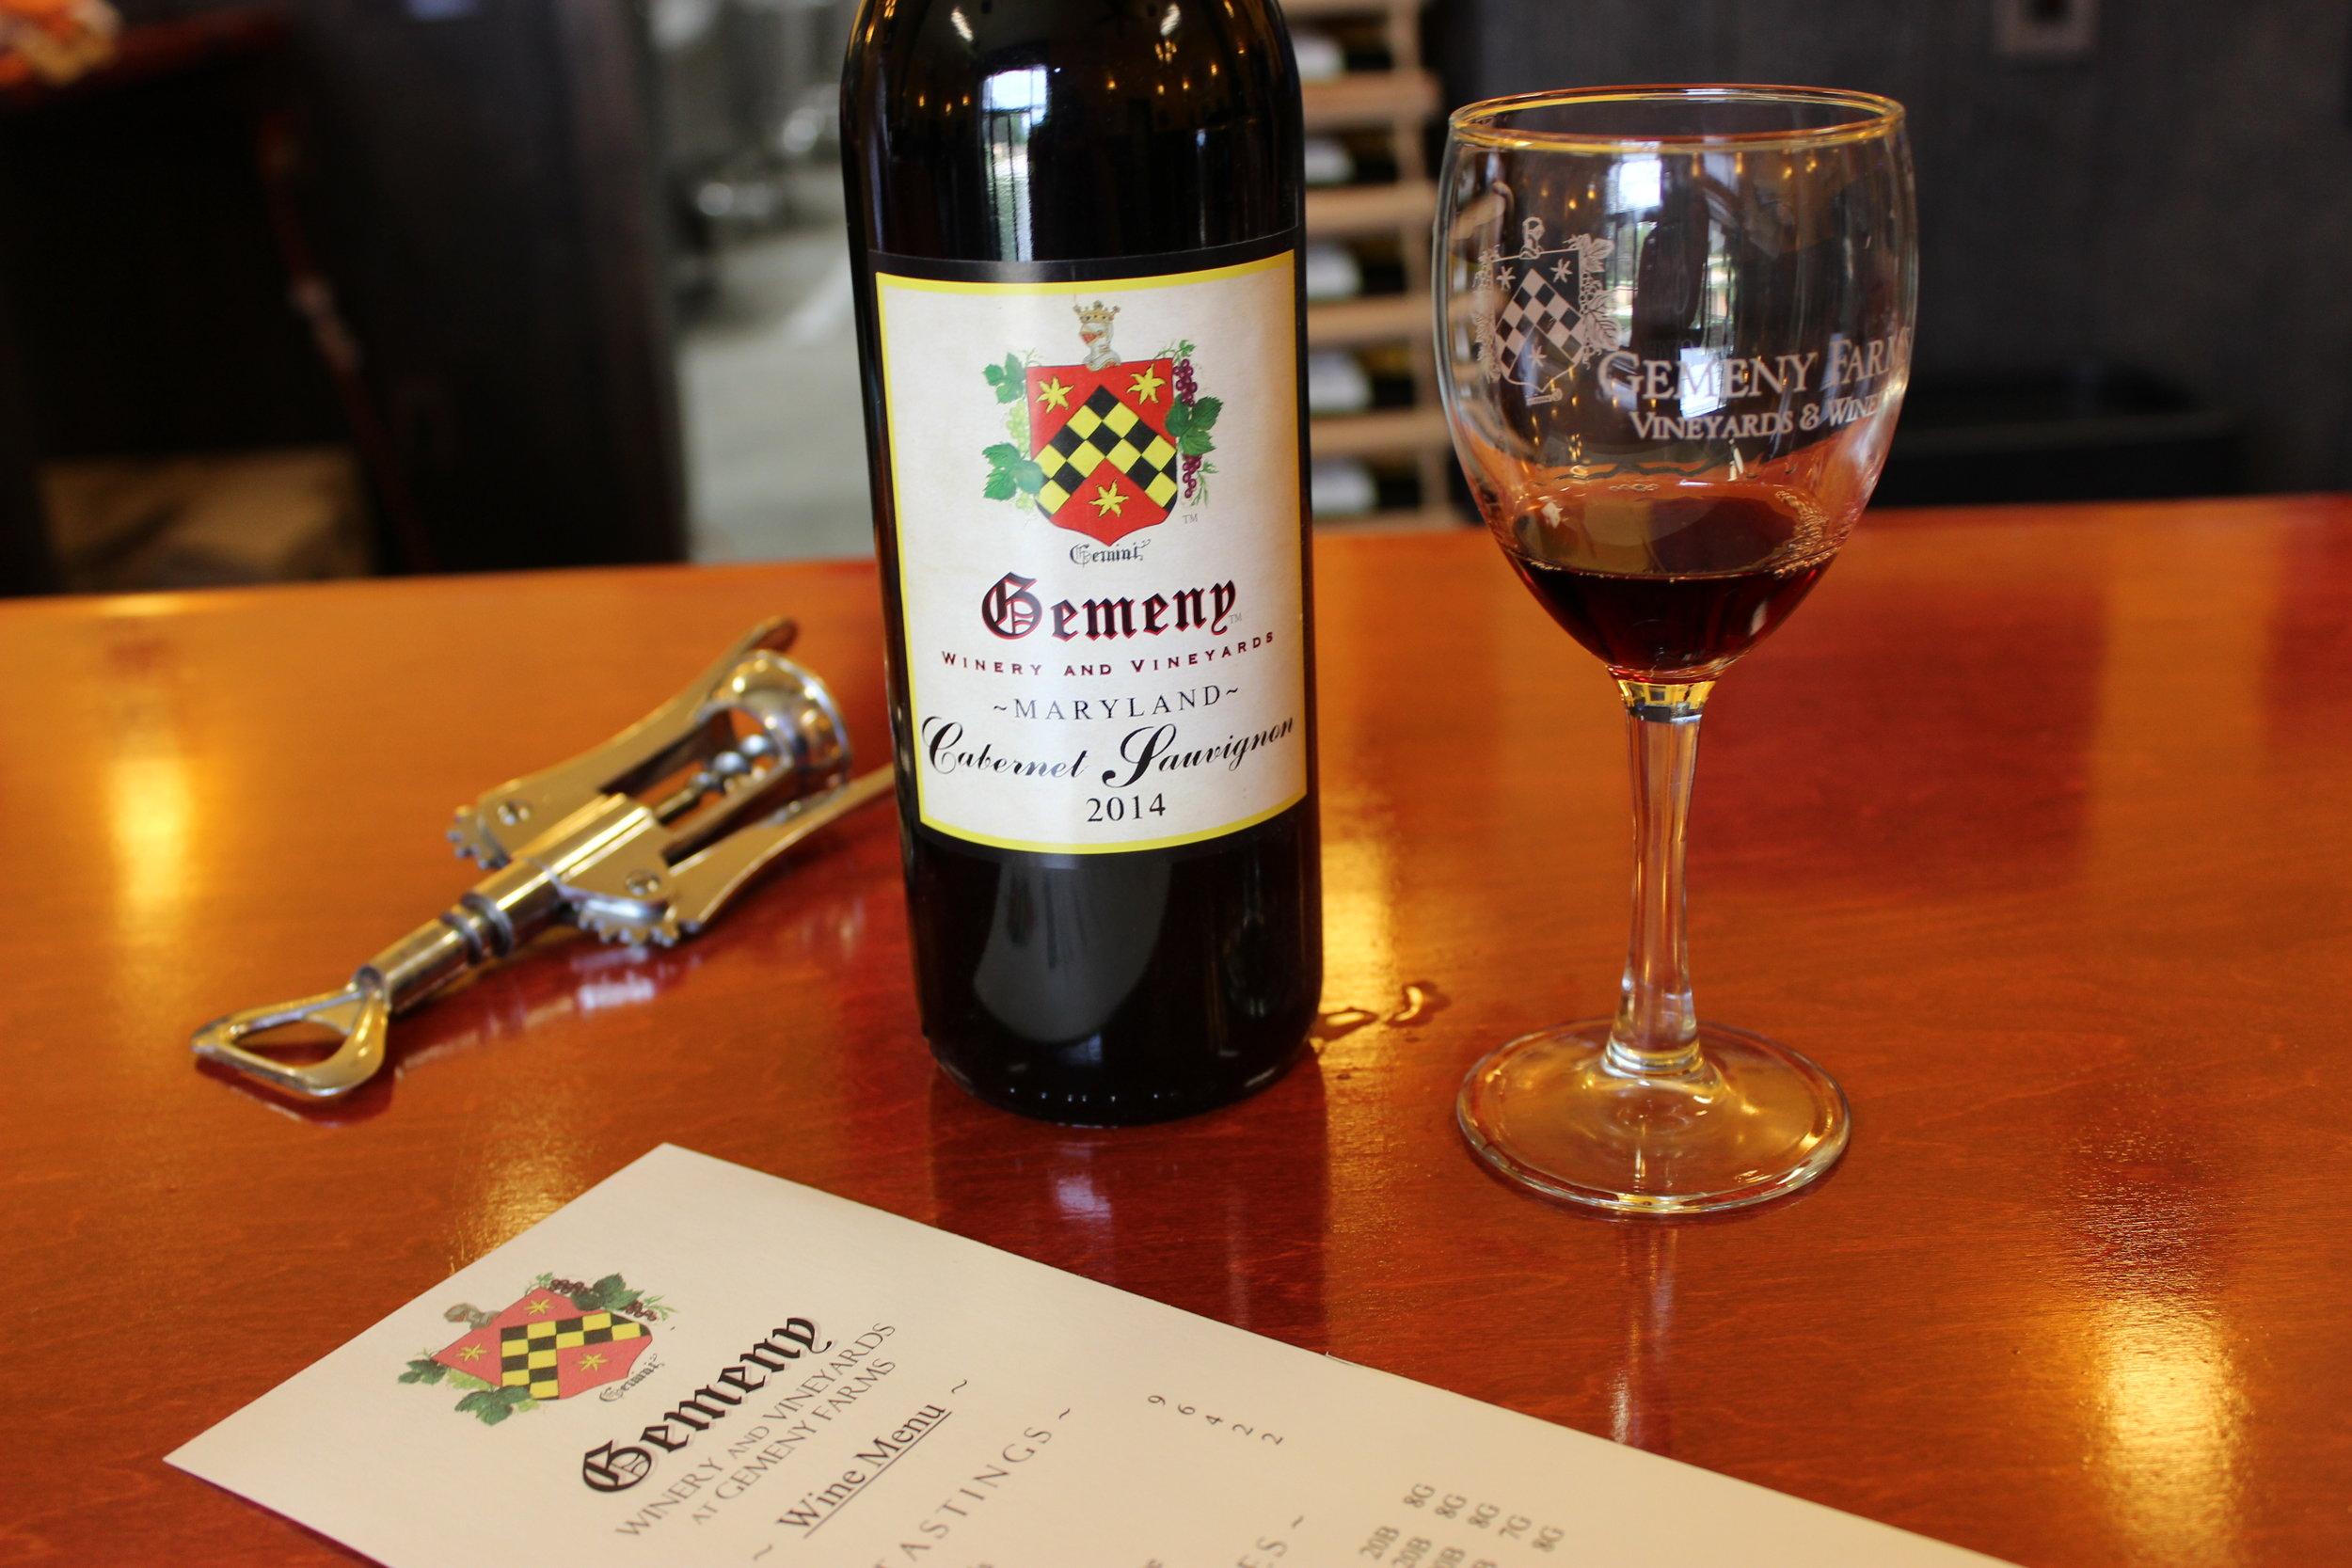 Gemeny Winery and Vineyards